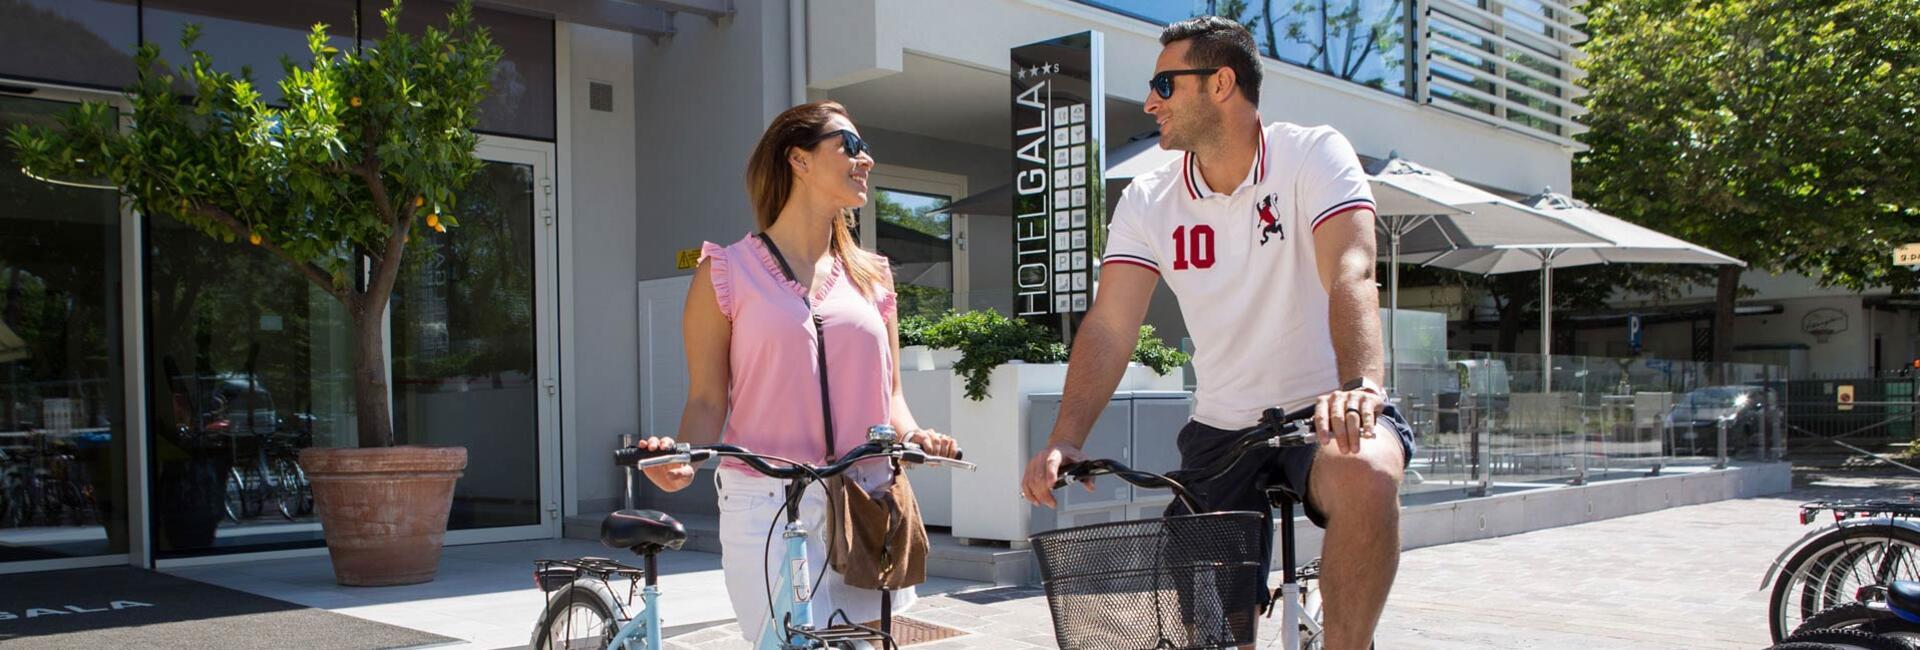 hotelgalamisano it bike-hotel 001